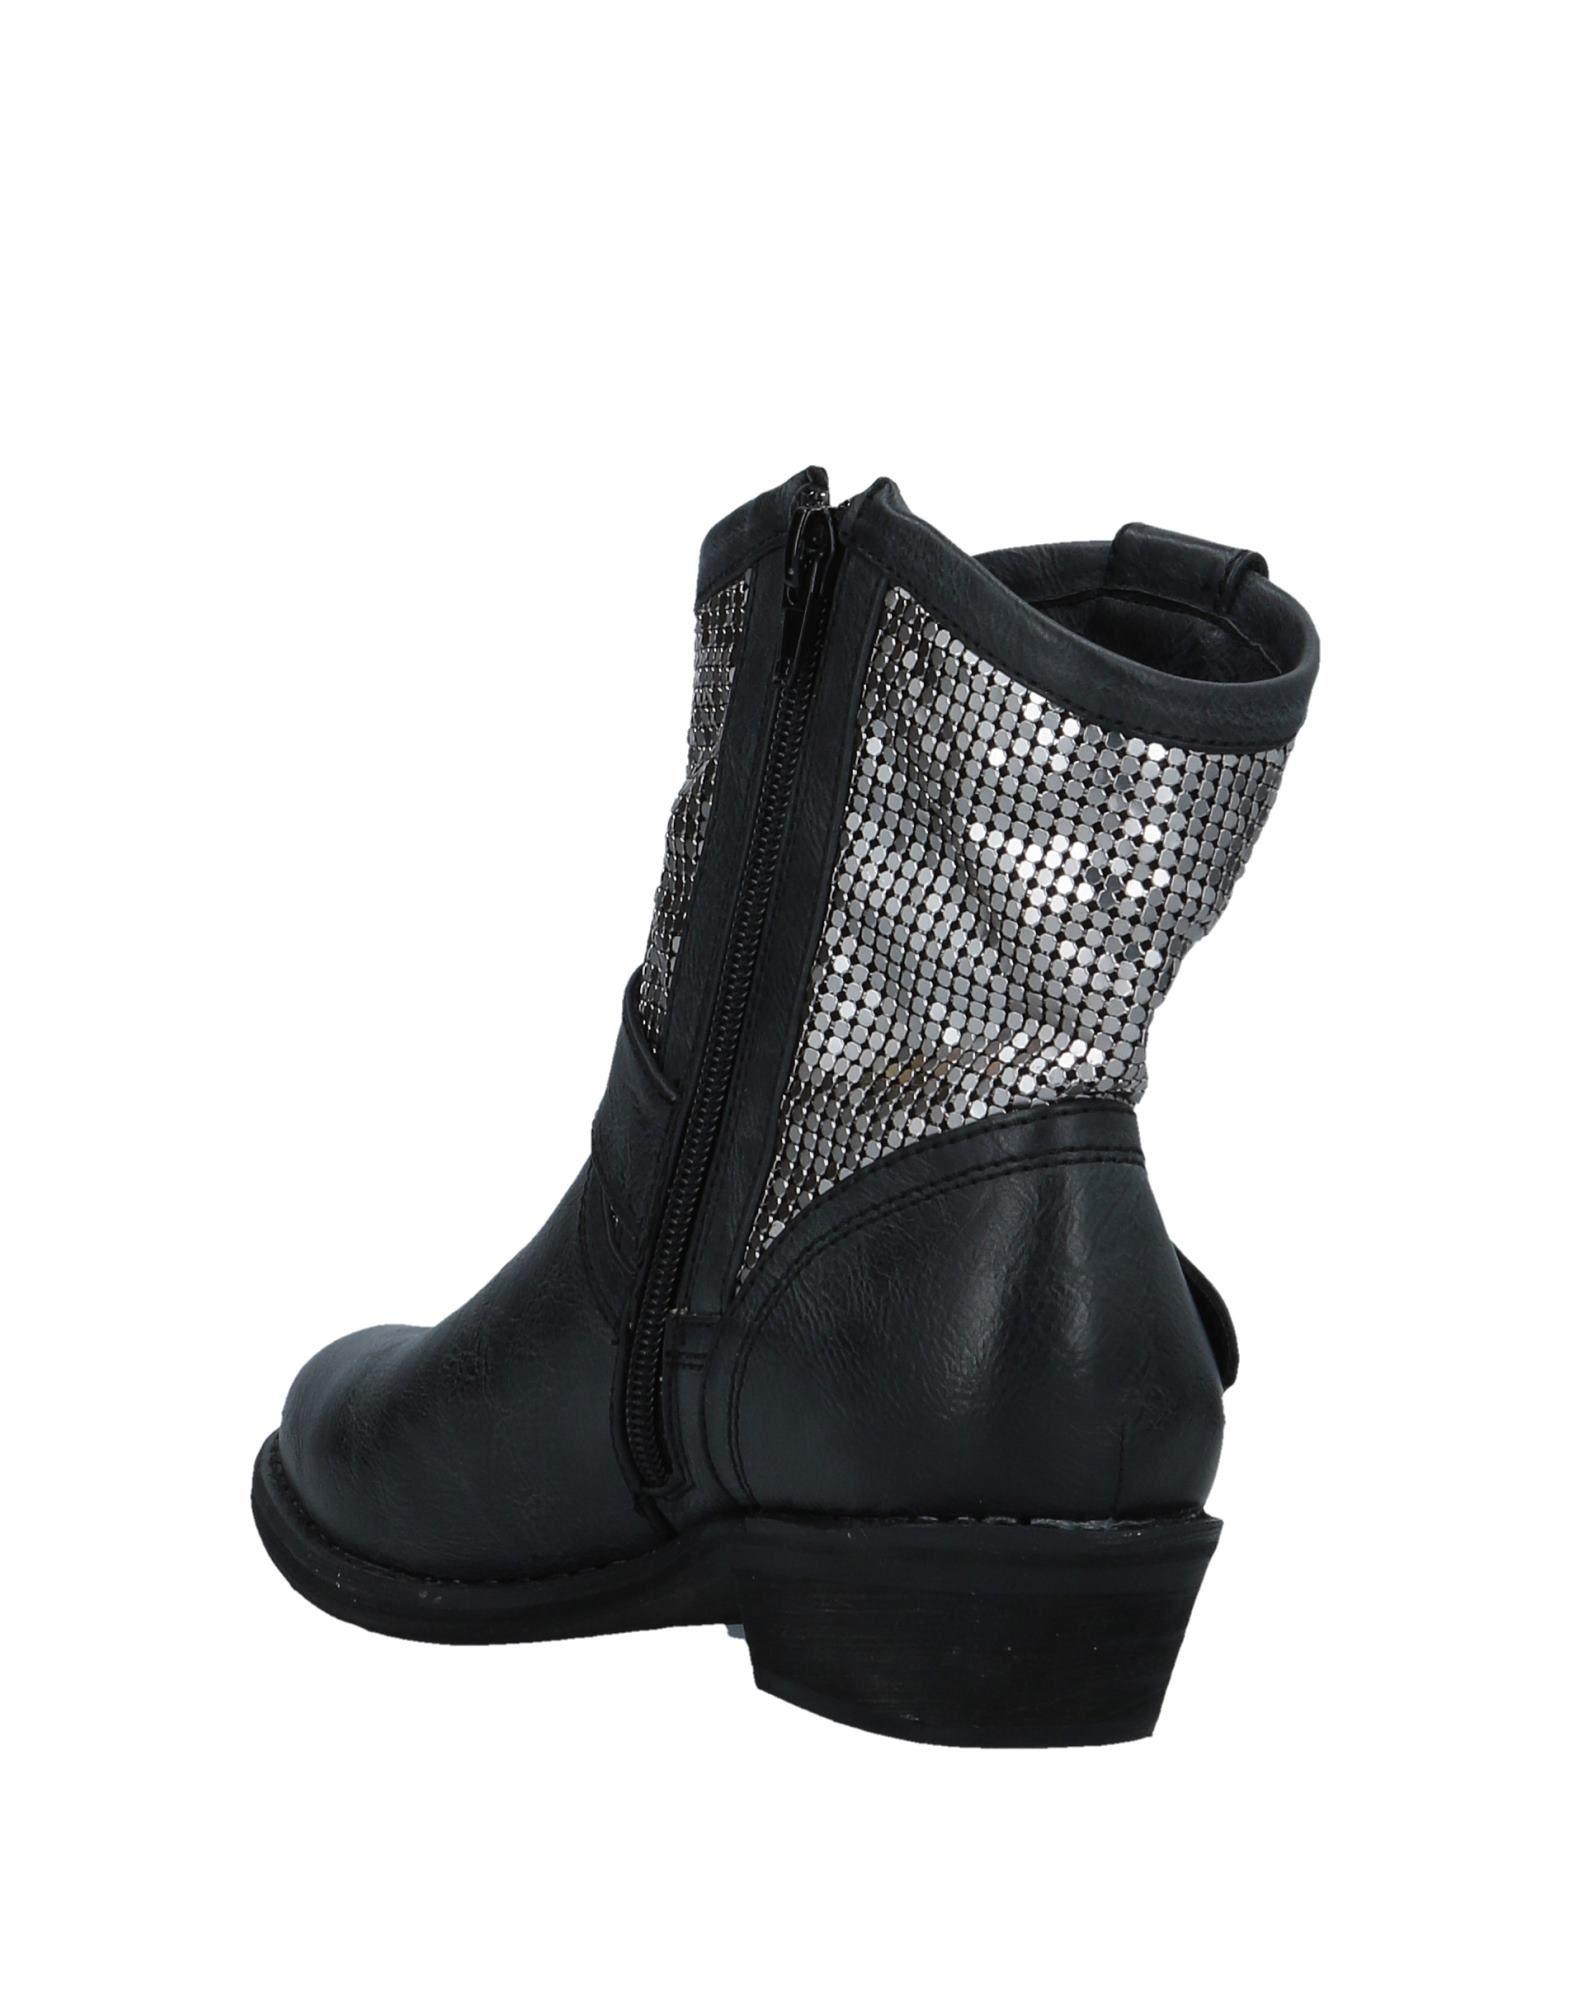 Francesco 11540428IB Milano Stiefelette Damen  11540428IB Francesco Gute Qualität beliebte Schuhe fd7e52